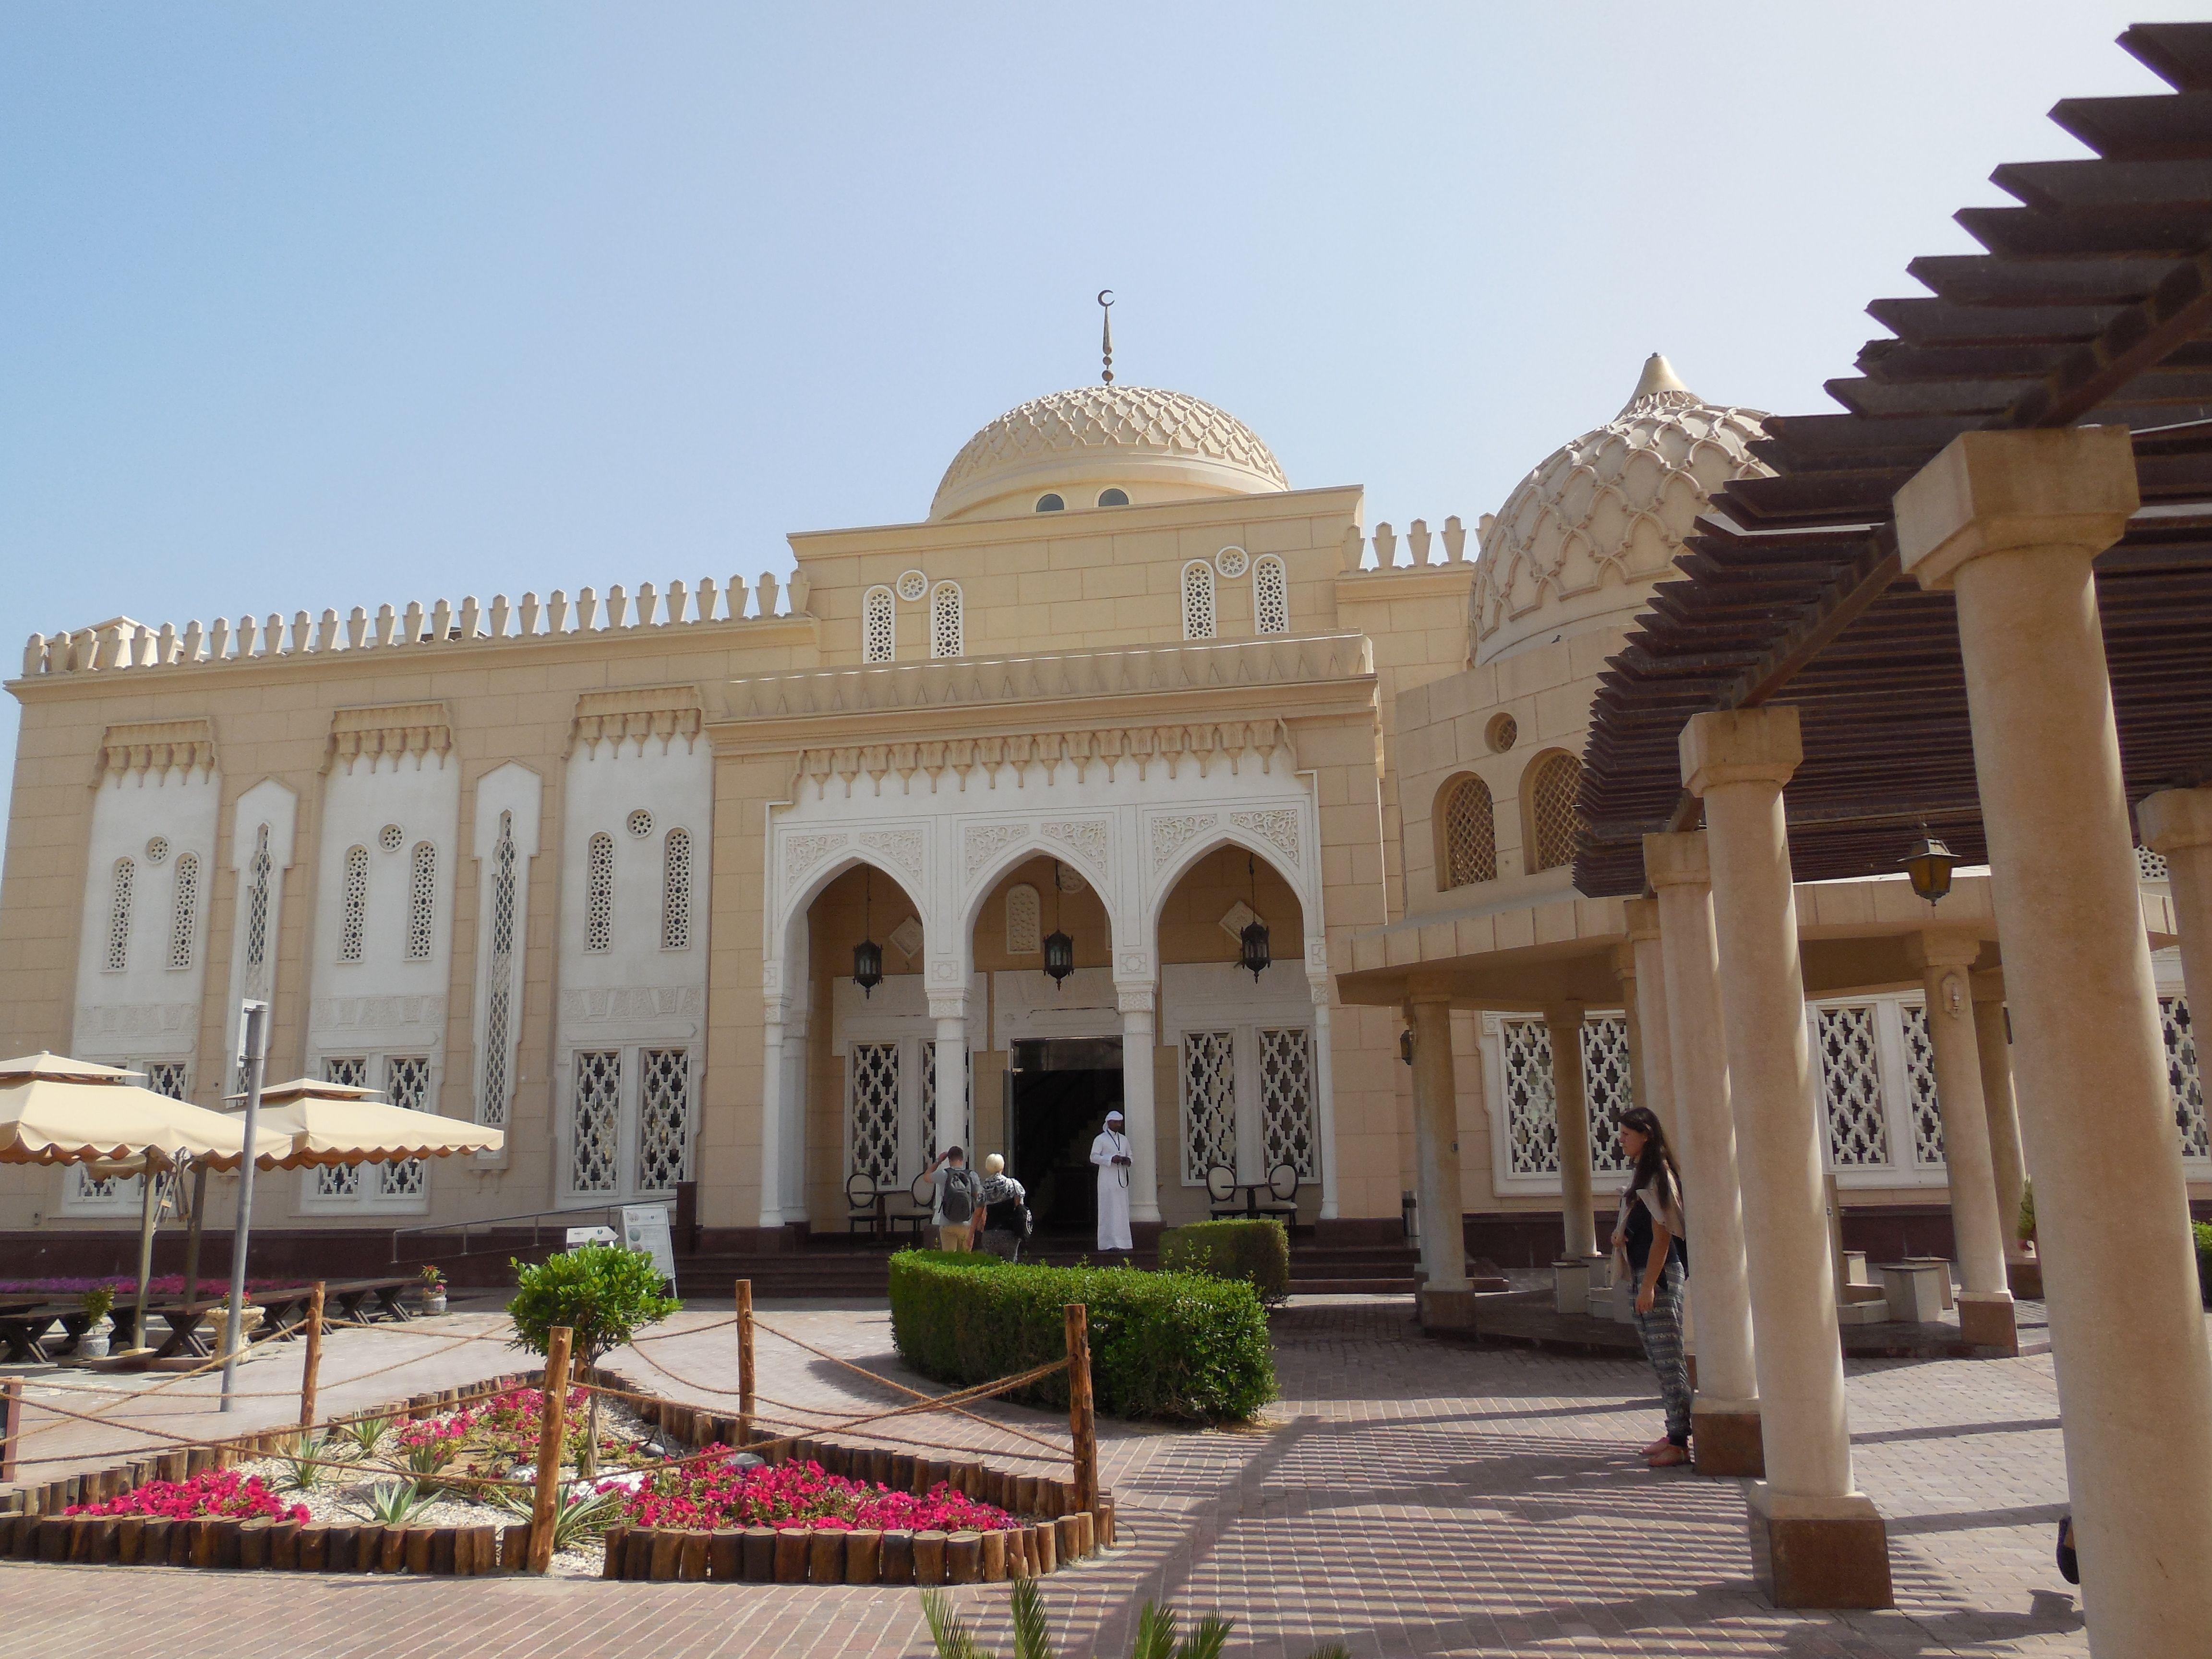 Ingang van de Jumeirah moskee #3MTT #NHTV